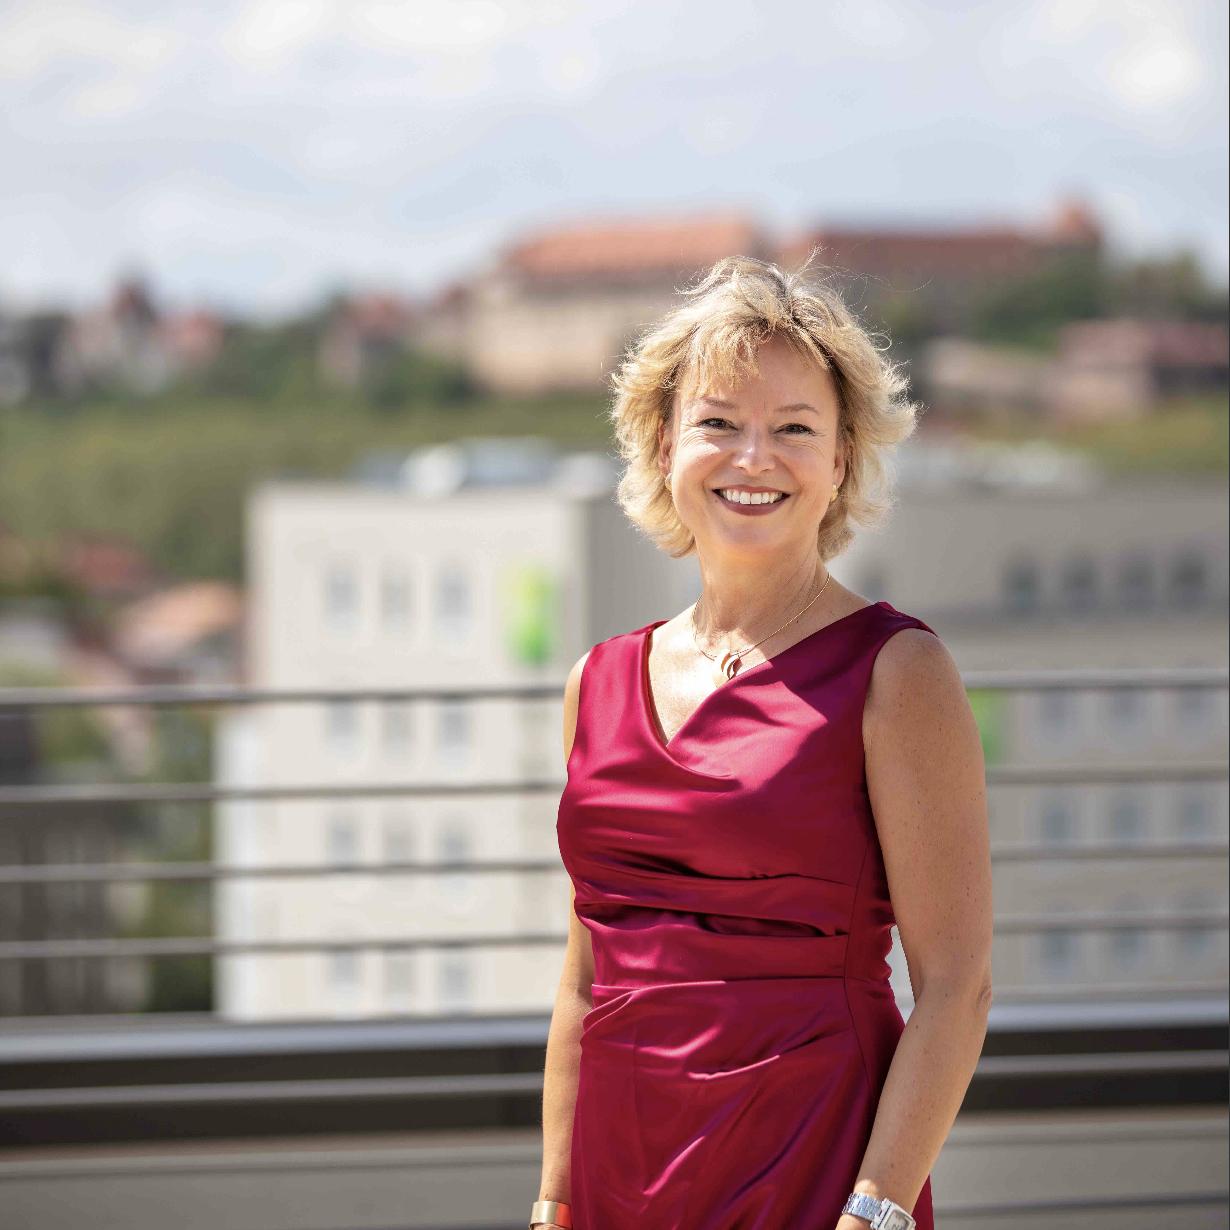 Anja Henke